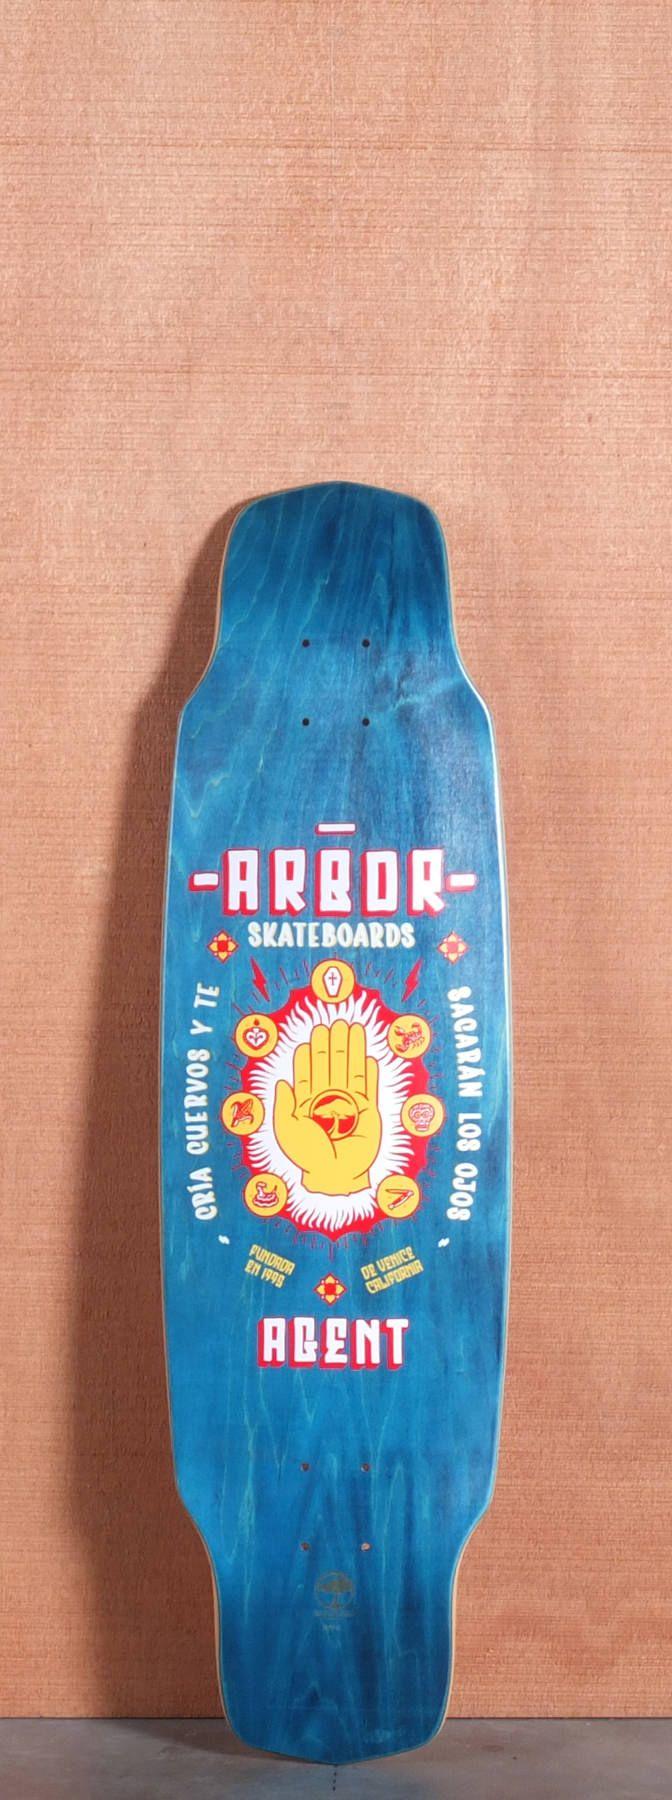 "Arbor 35"" Agent Longboard Deck"